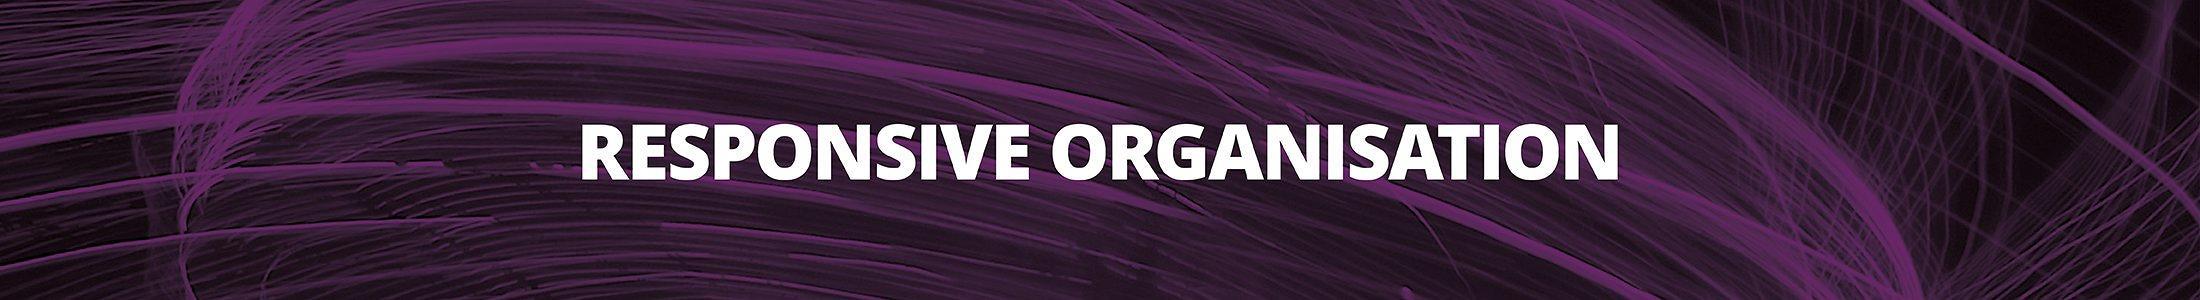 Responsive Organisation - An executive round tabble